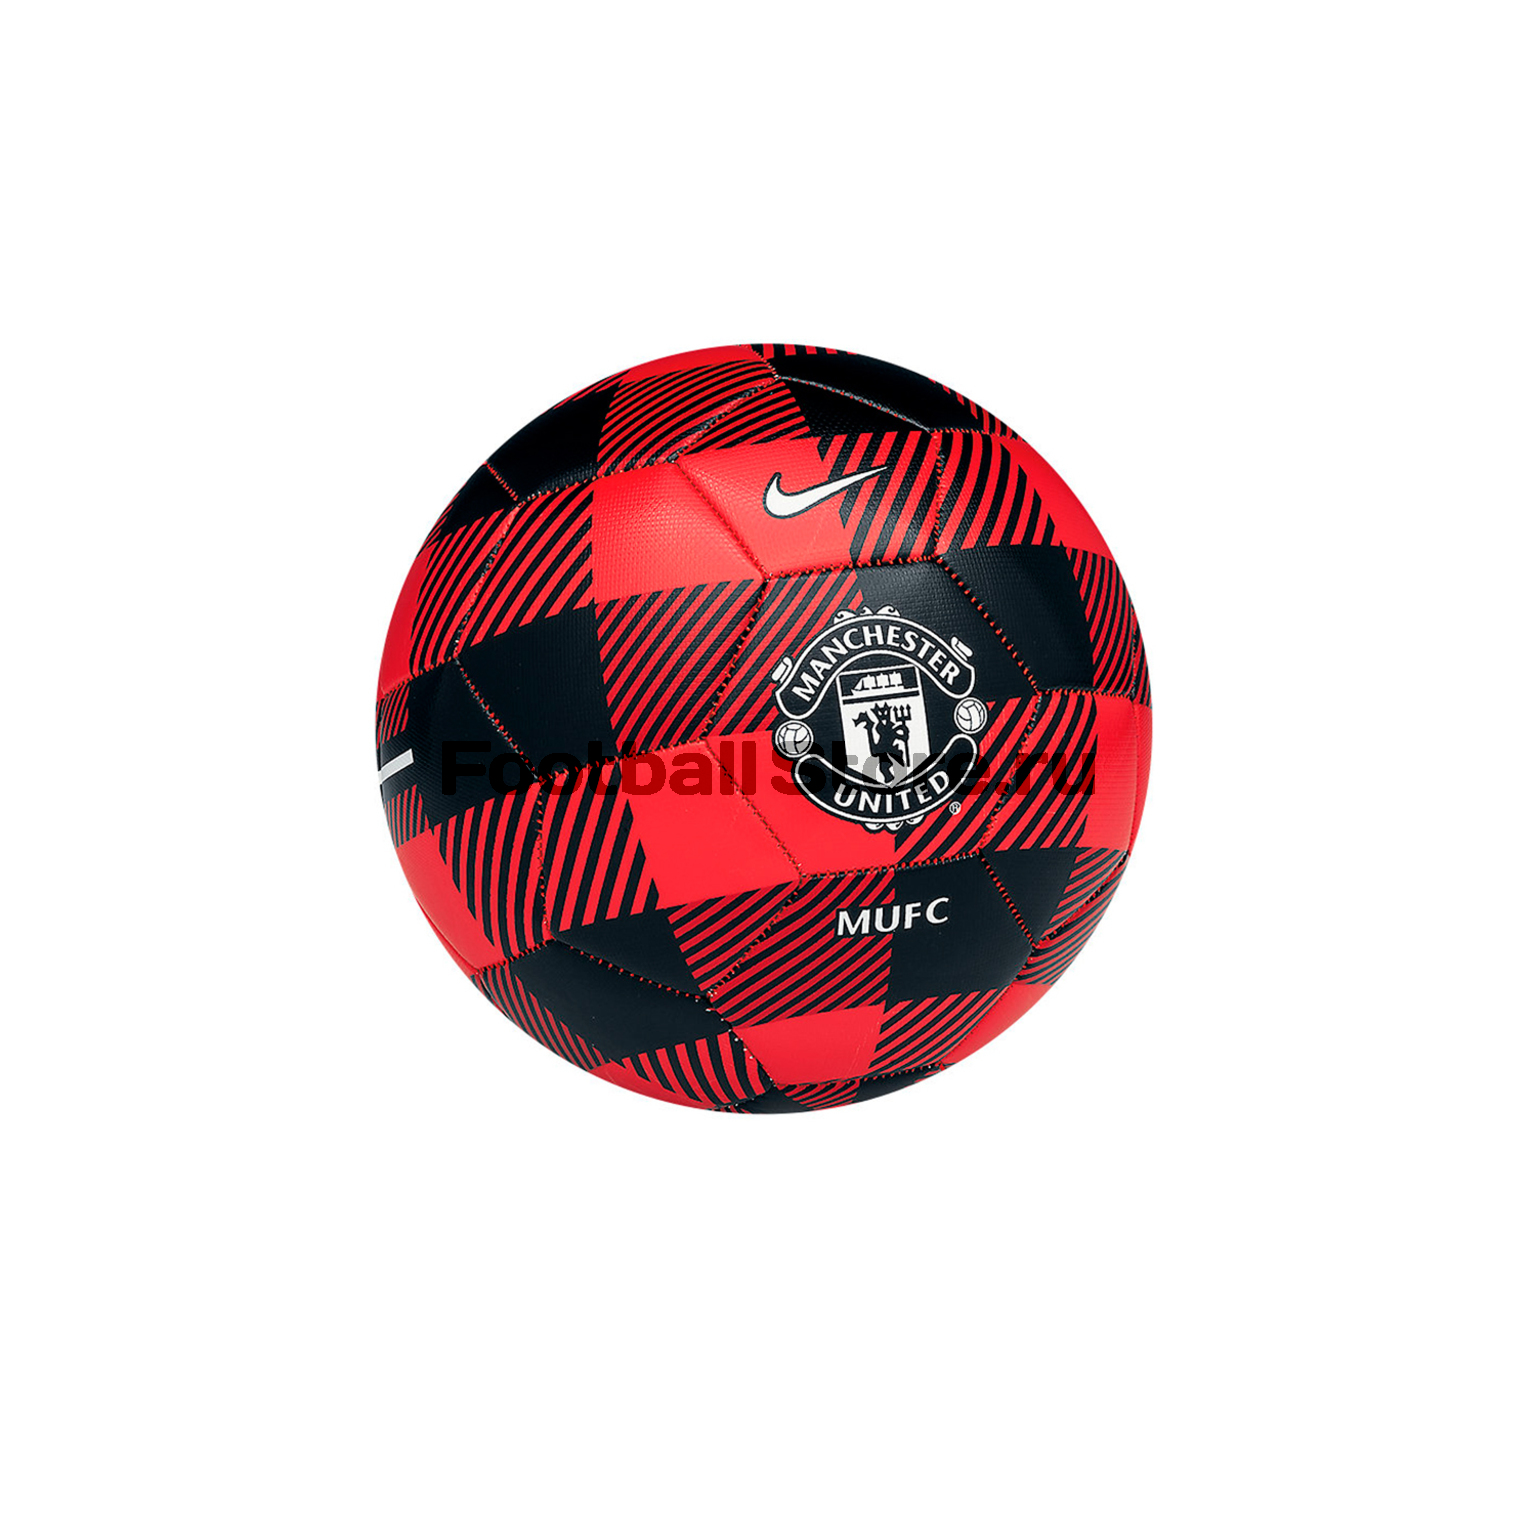 Сувенирные Nike Мяч сувенирный Nike Man Utd Skills SC2478-601